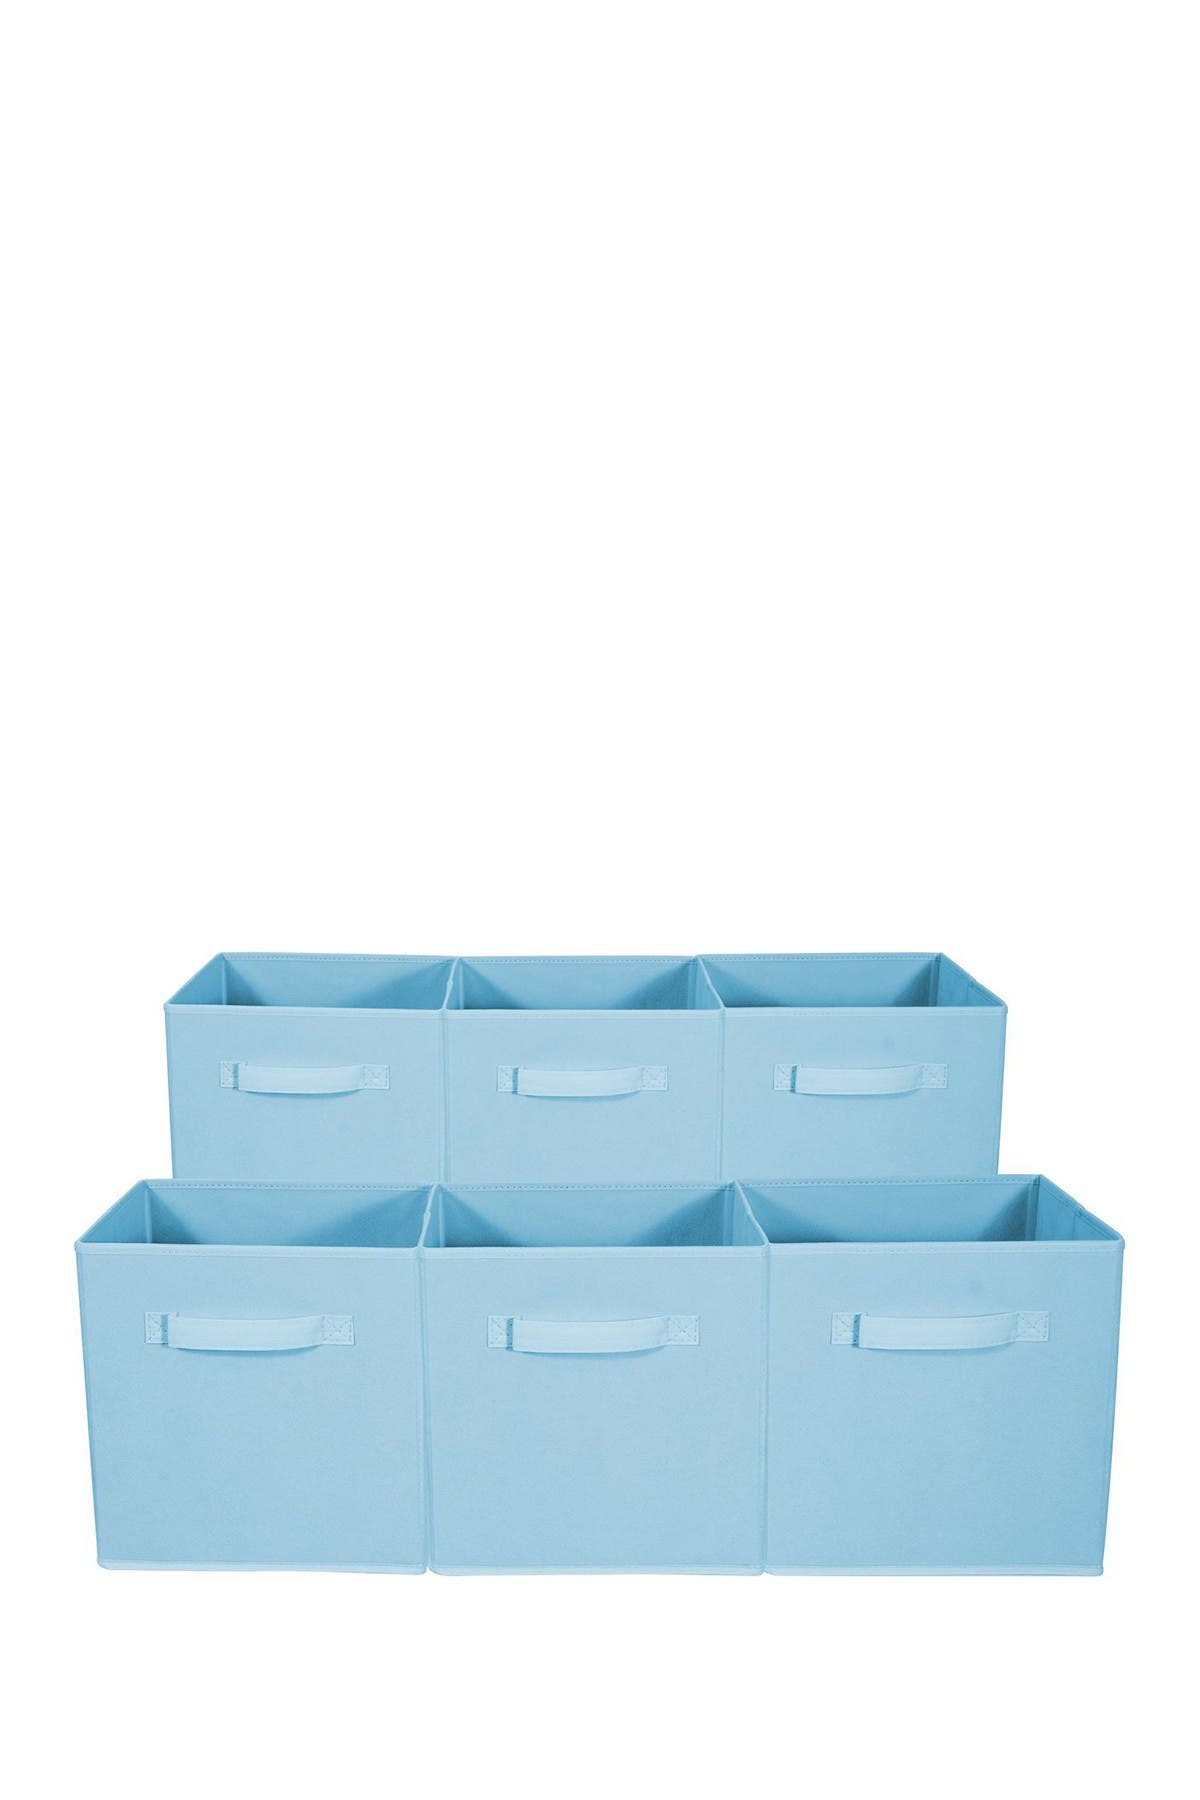 Image of Sorbus Foldable Storage Cube Basket Bin - Set of 6 - Pastel Blue